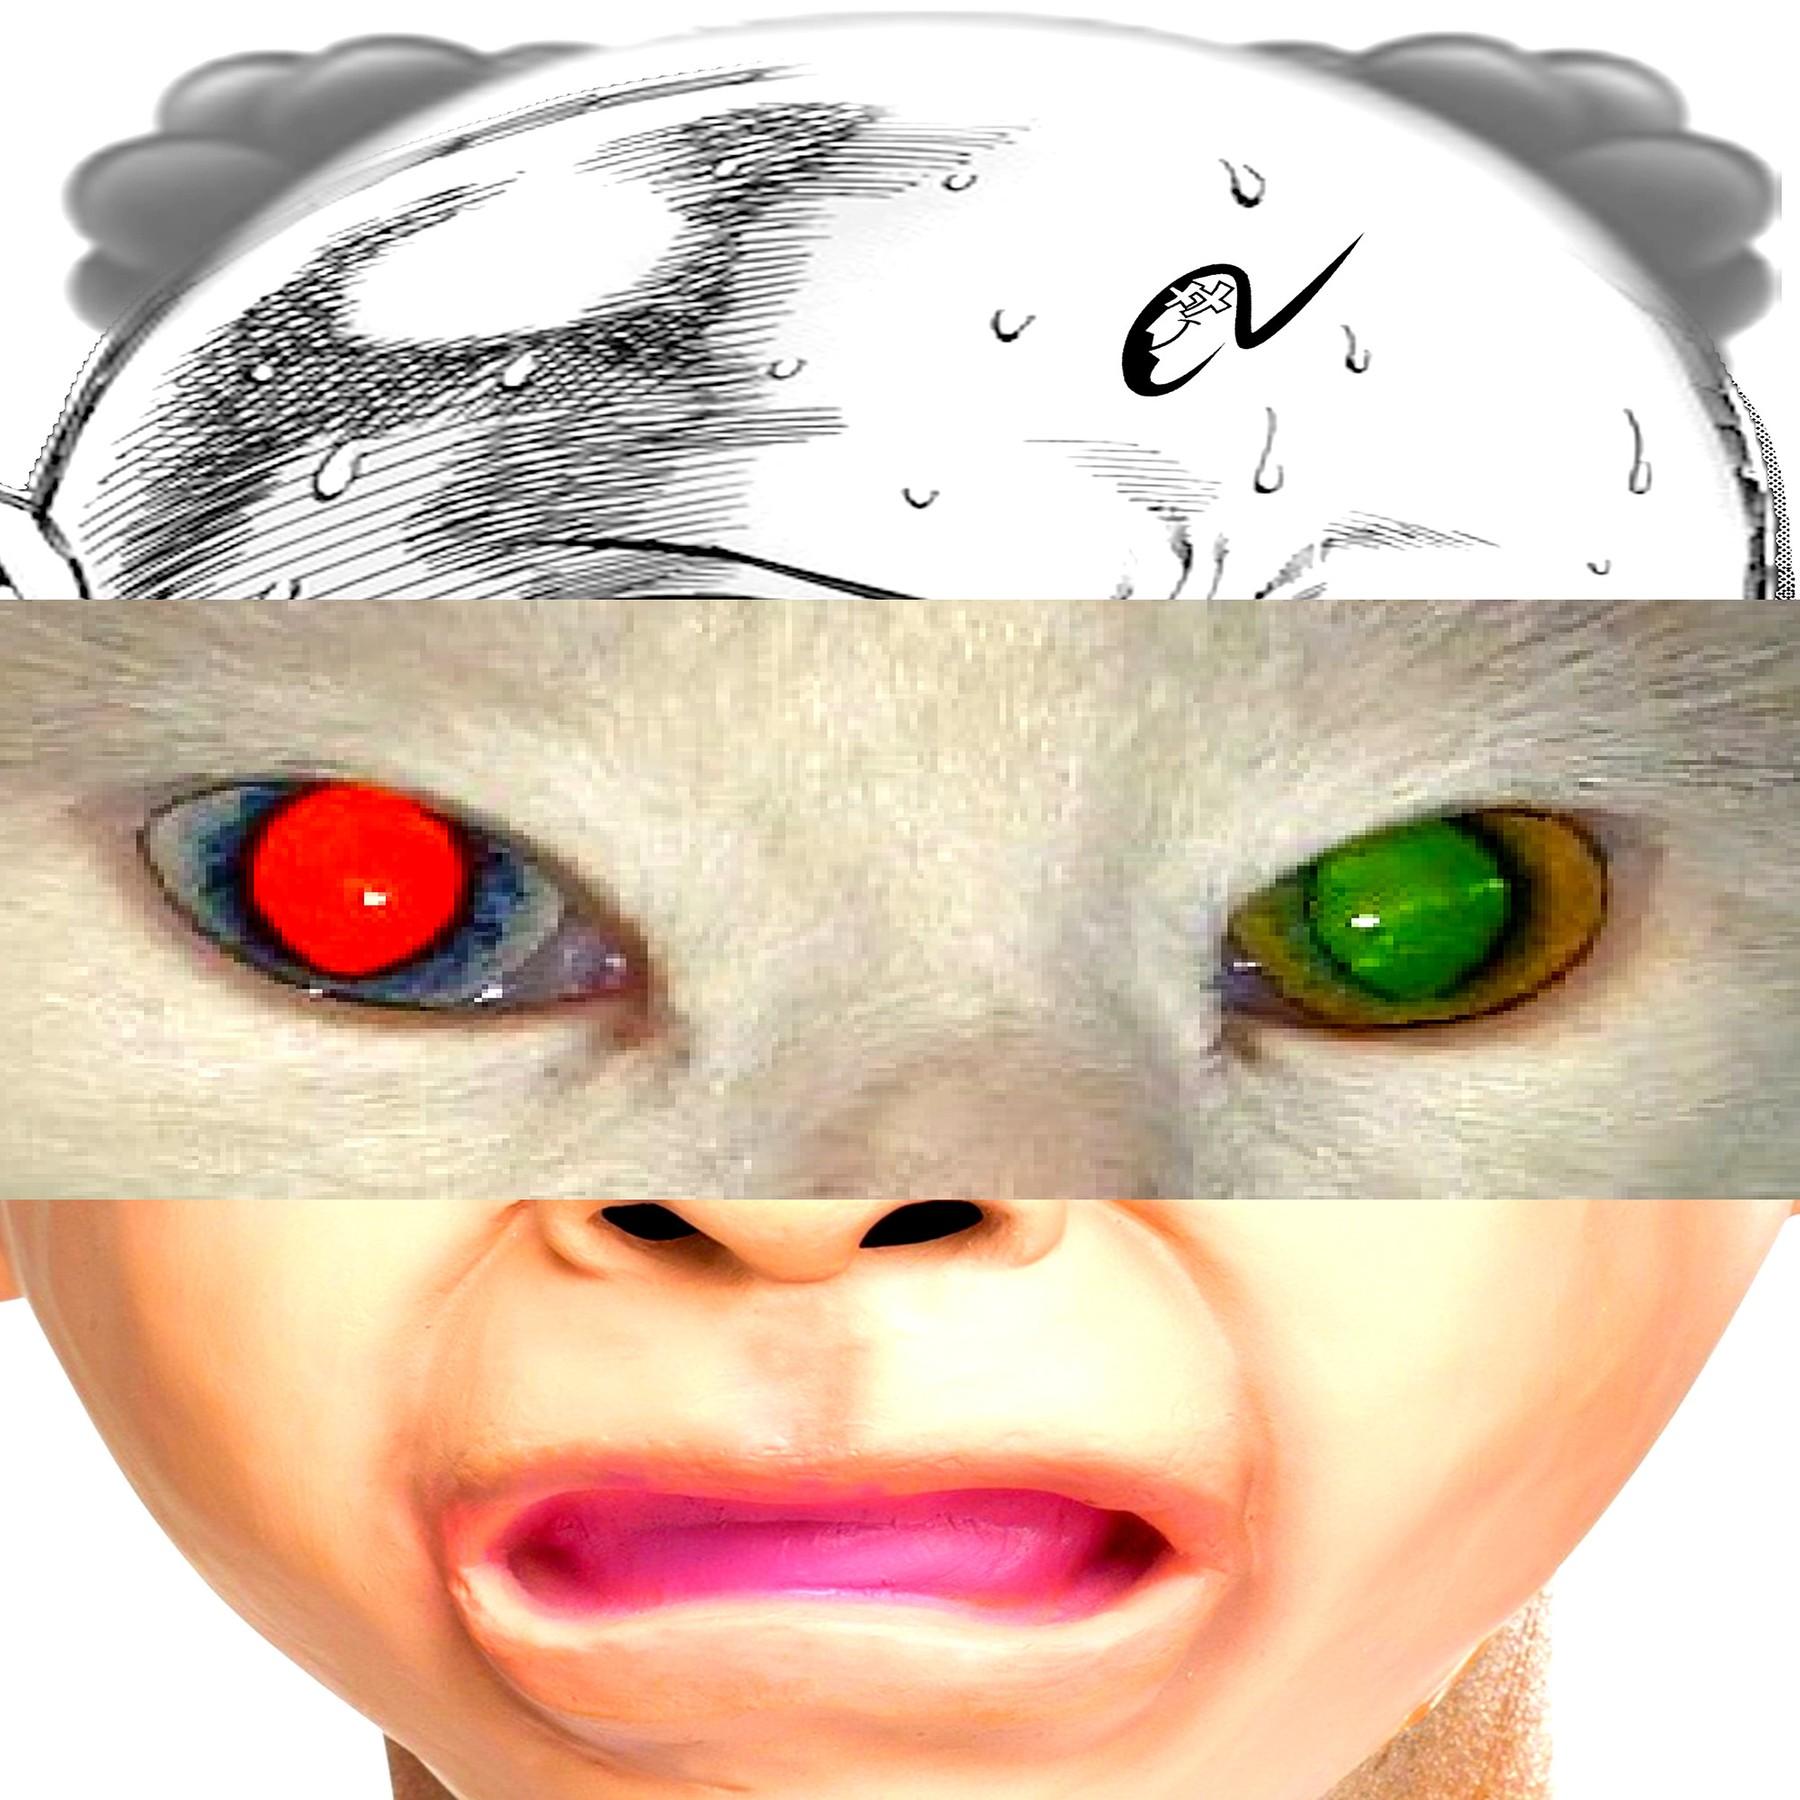 amnesia-scanner__0461__obsequious.jpg